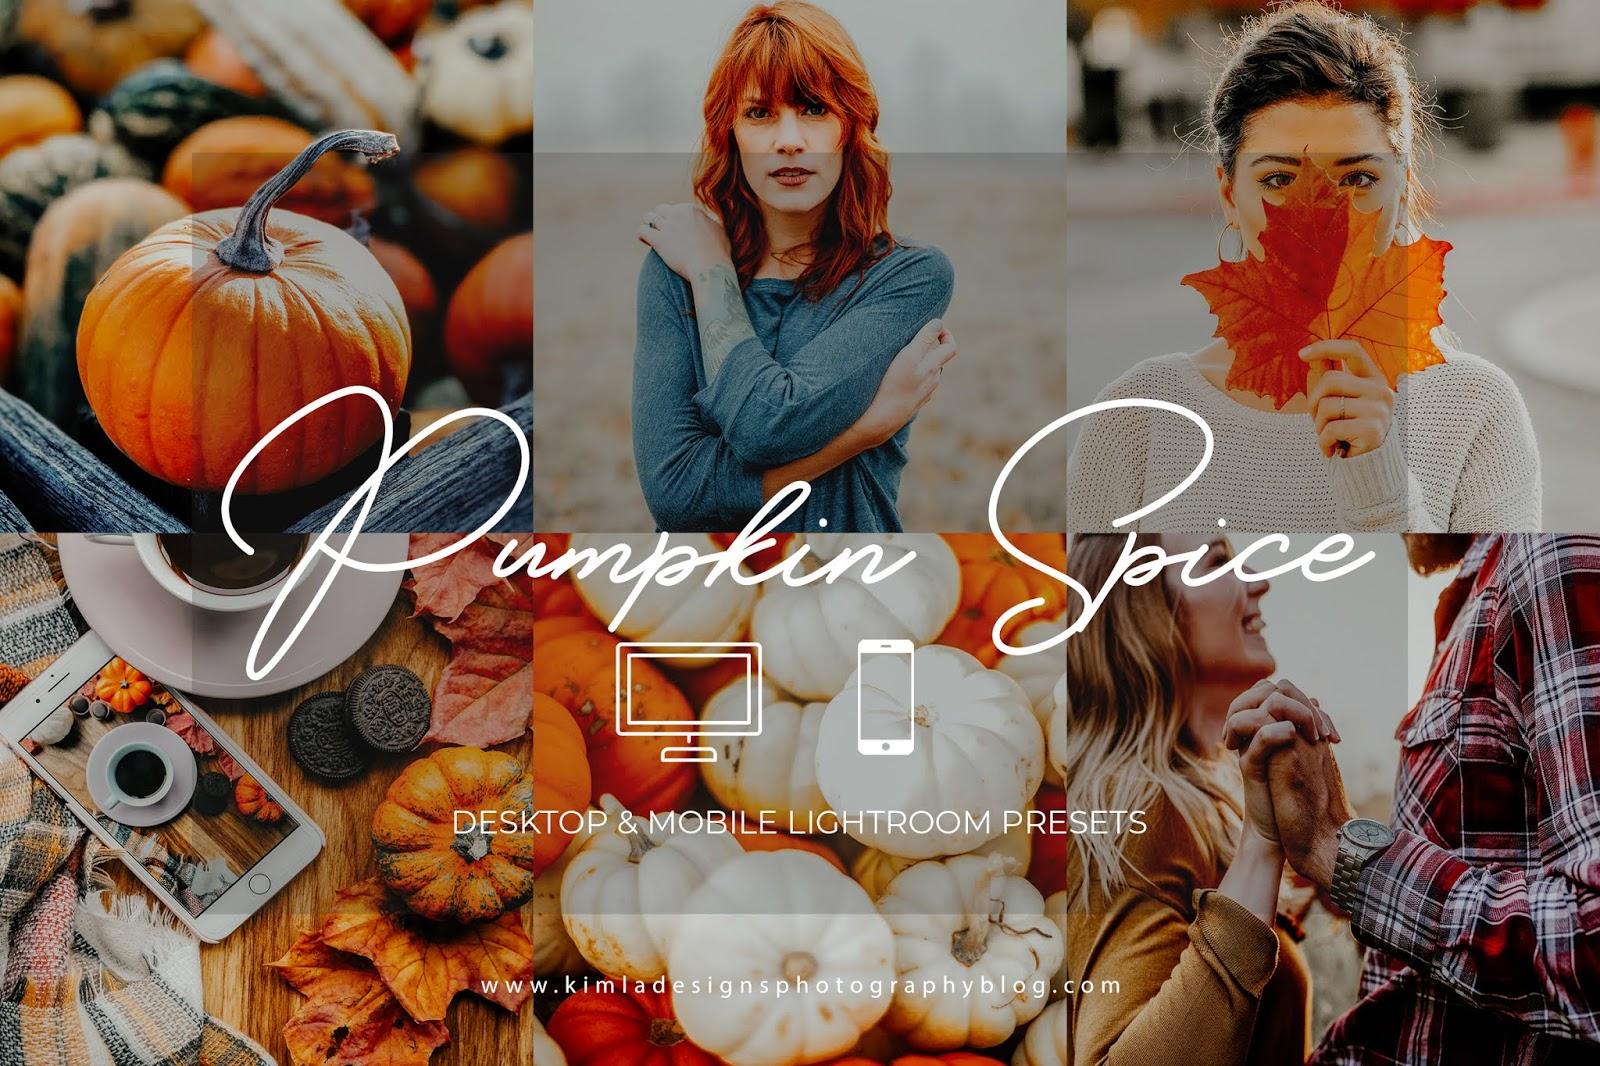 https://1.bp.blogspot.com/-SoxXknb4QCM/XZcBIAFhpsI/AAAAAAAAFNo/3kvT_9068kE-En__6ekct6CkXxbqPRXwACLcBGAsYHQ/s1600/Pumpkin-Spice-Fall-Lightroom-PResets-for-Bloggers-and-Photographers-Blog-Freebie.jpg